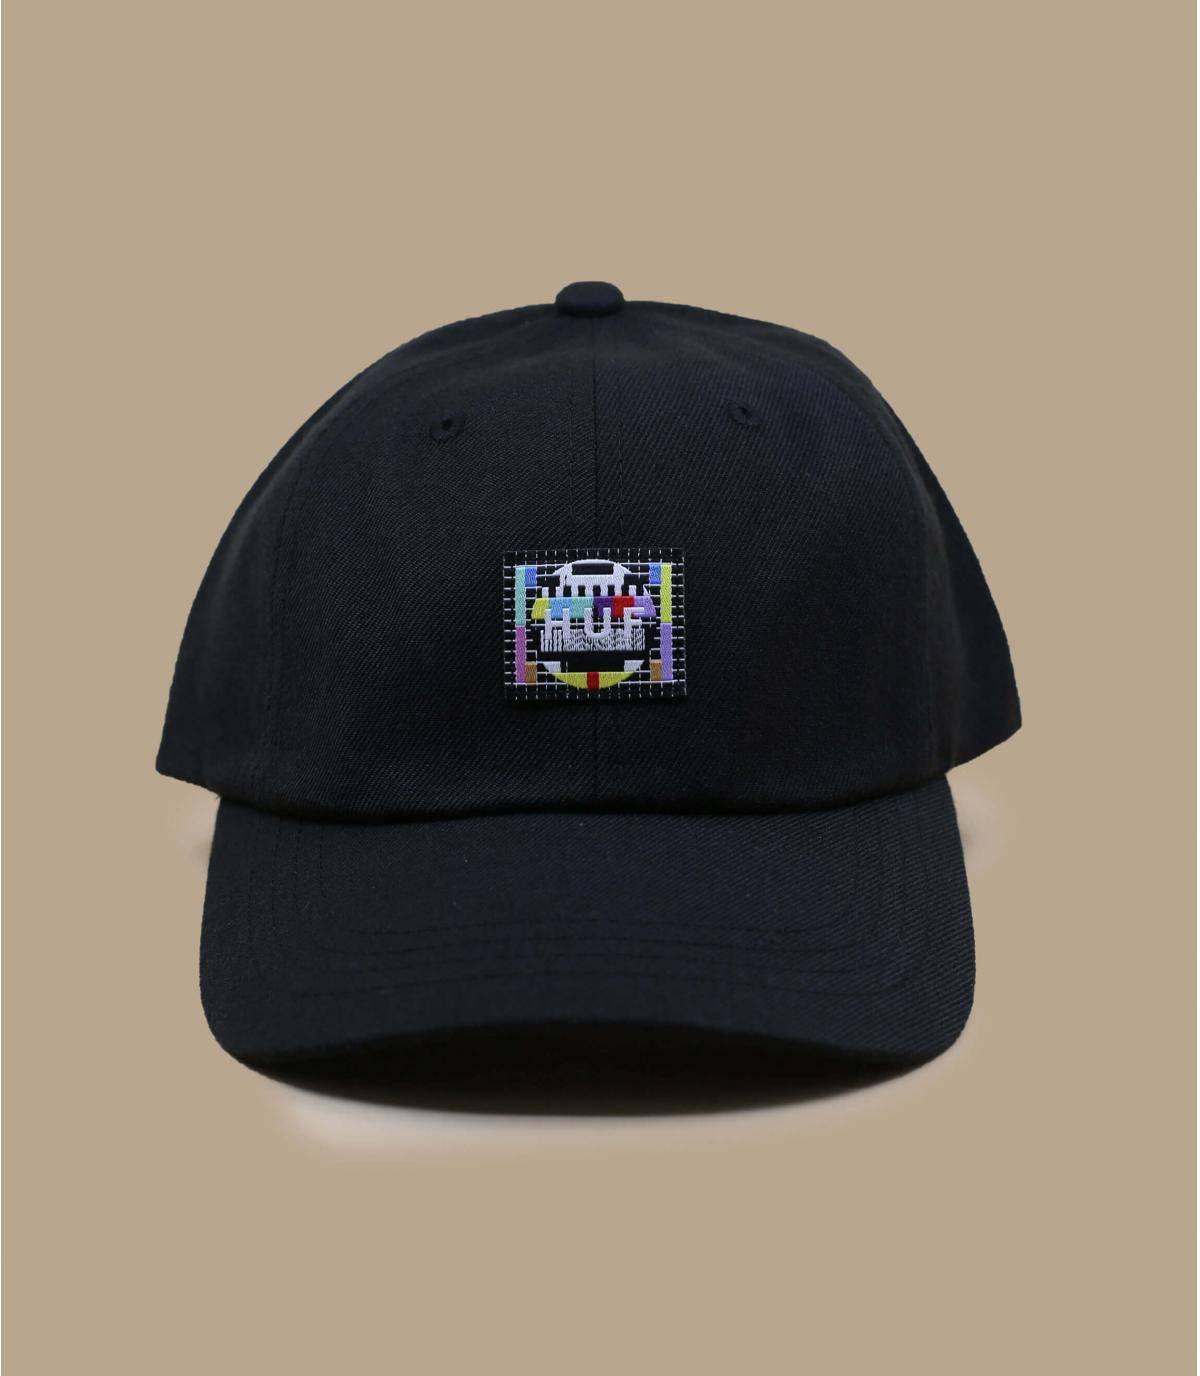 casquette Huf noir